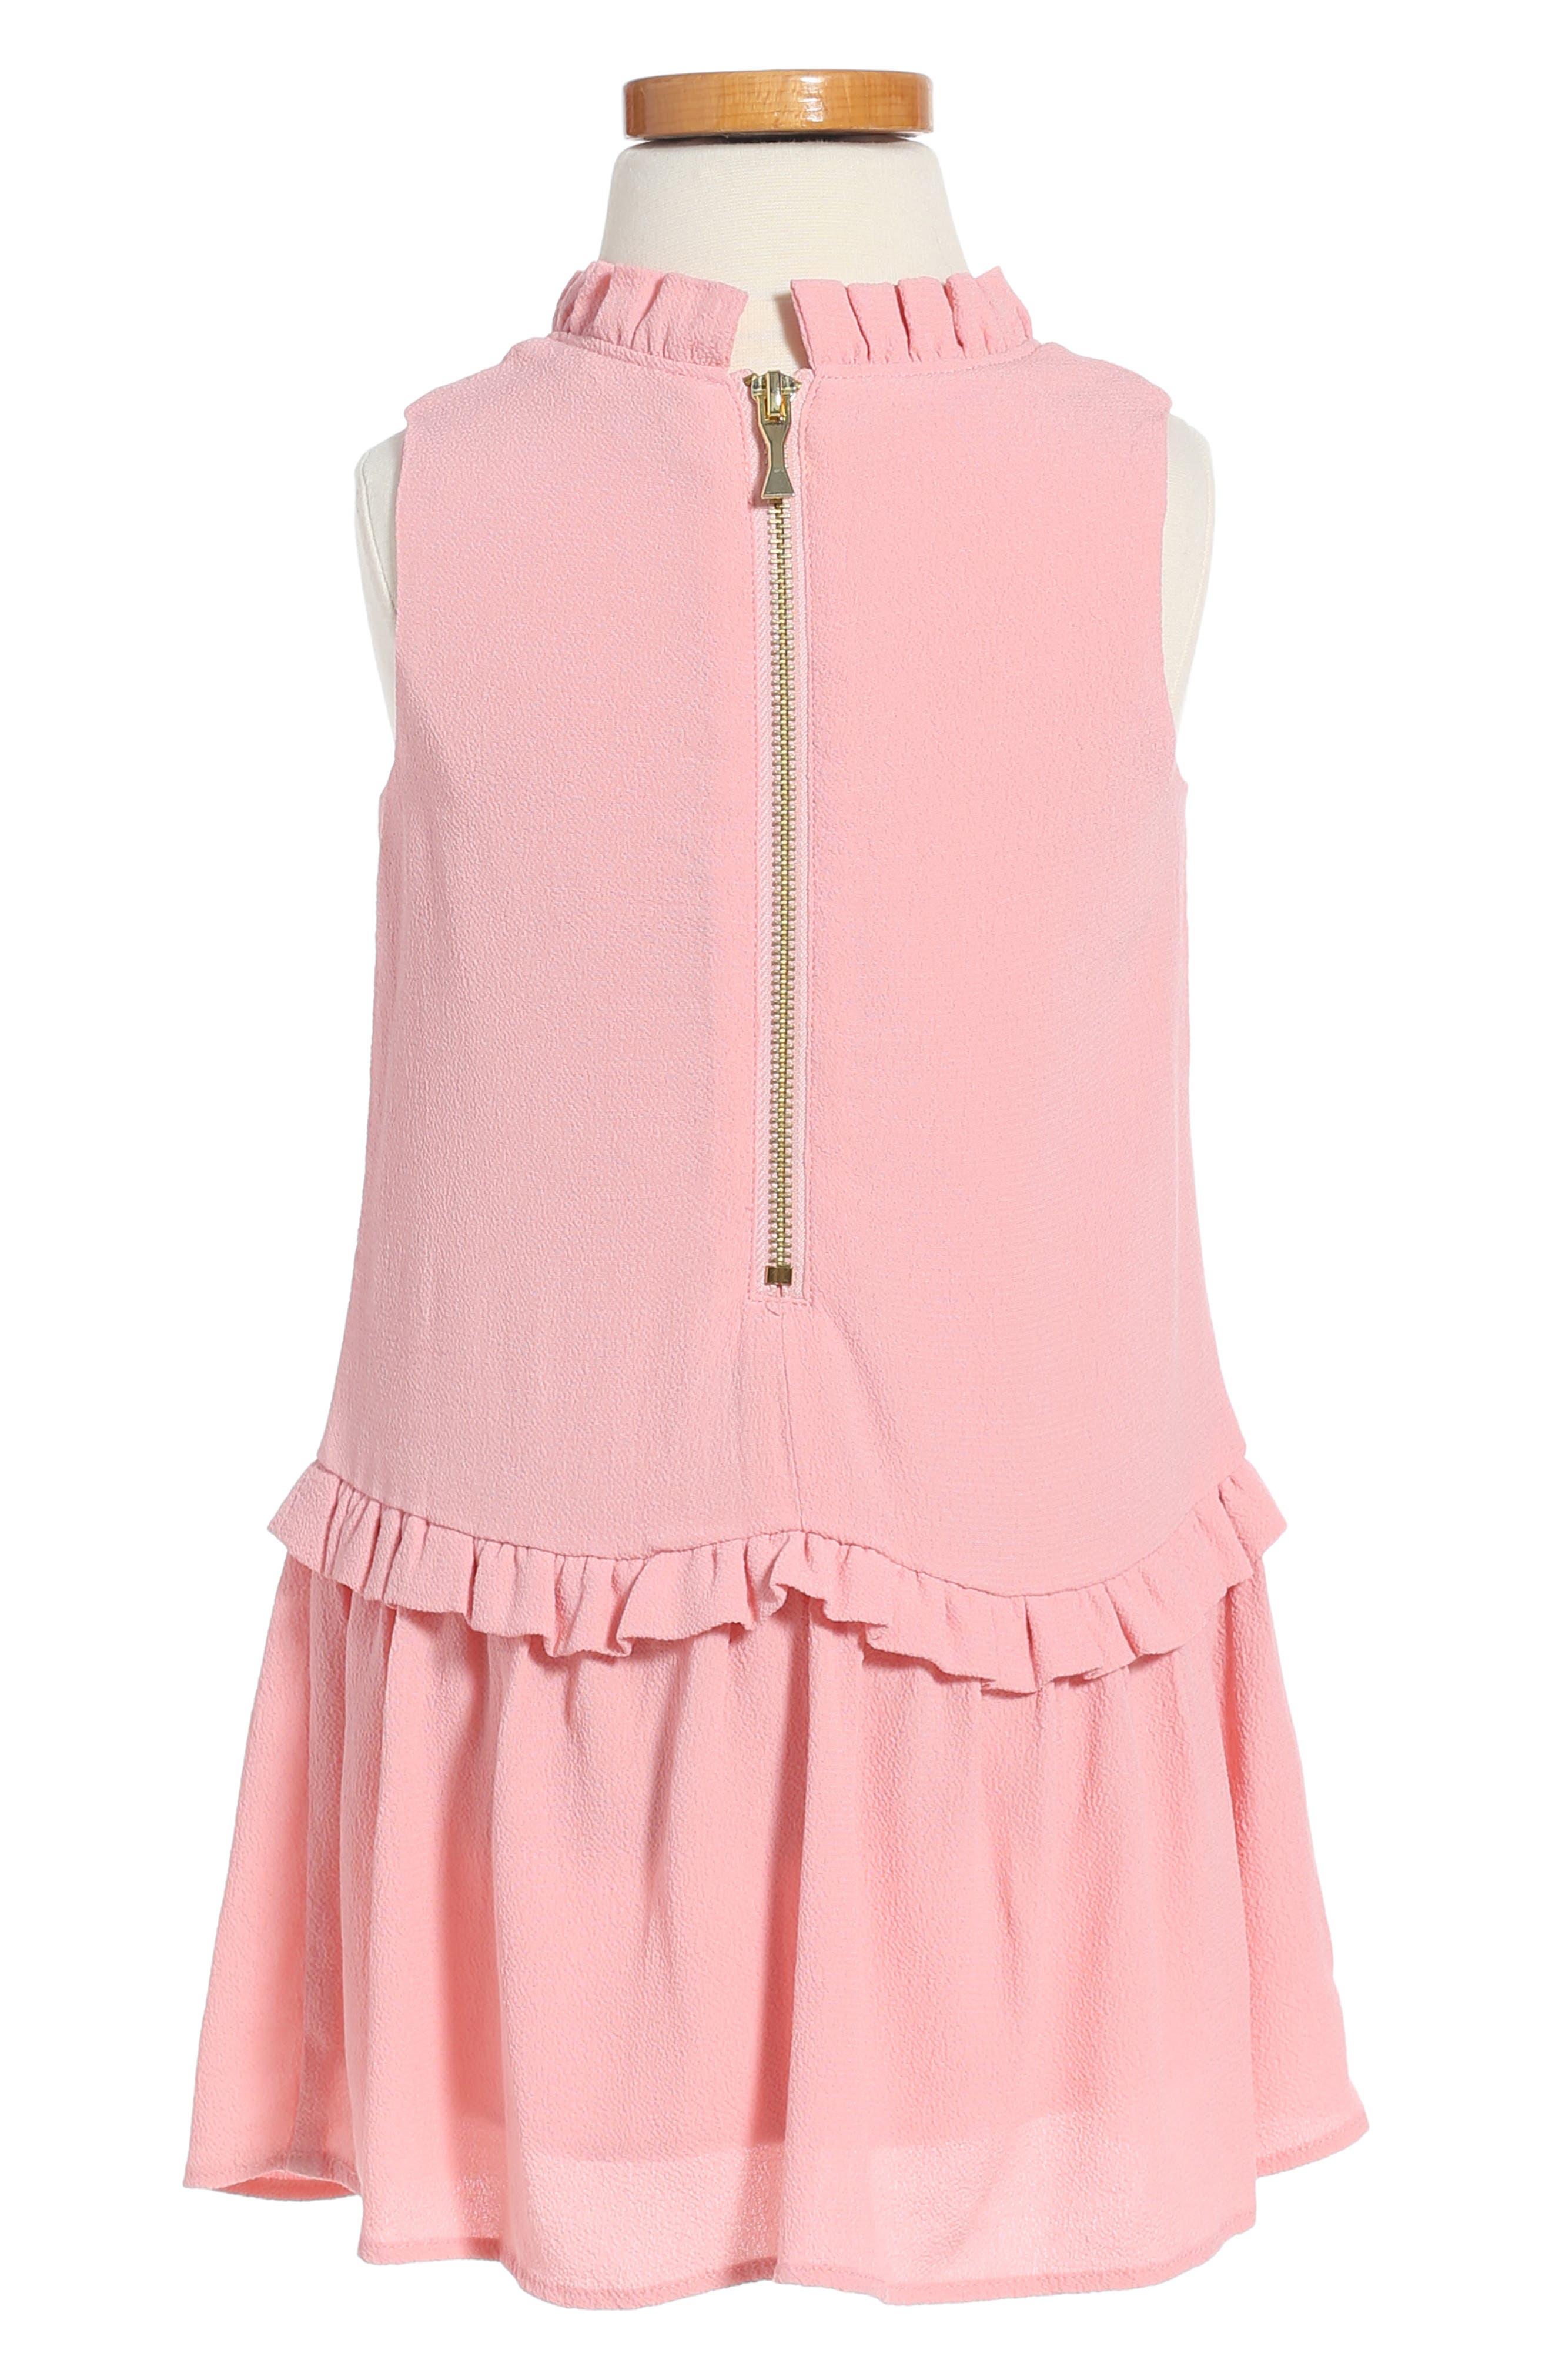 Alternate Image 2  - kate spade new york ruffle collar dress (Toddler Girls & Little Girls)